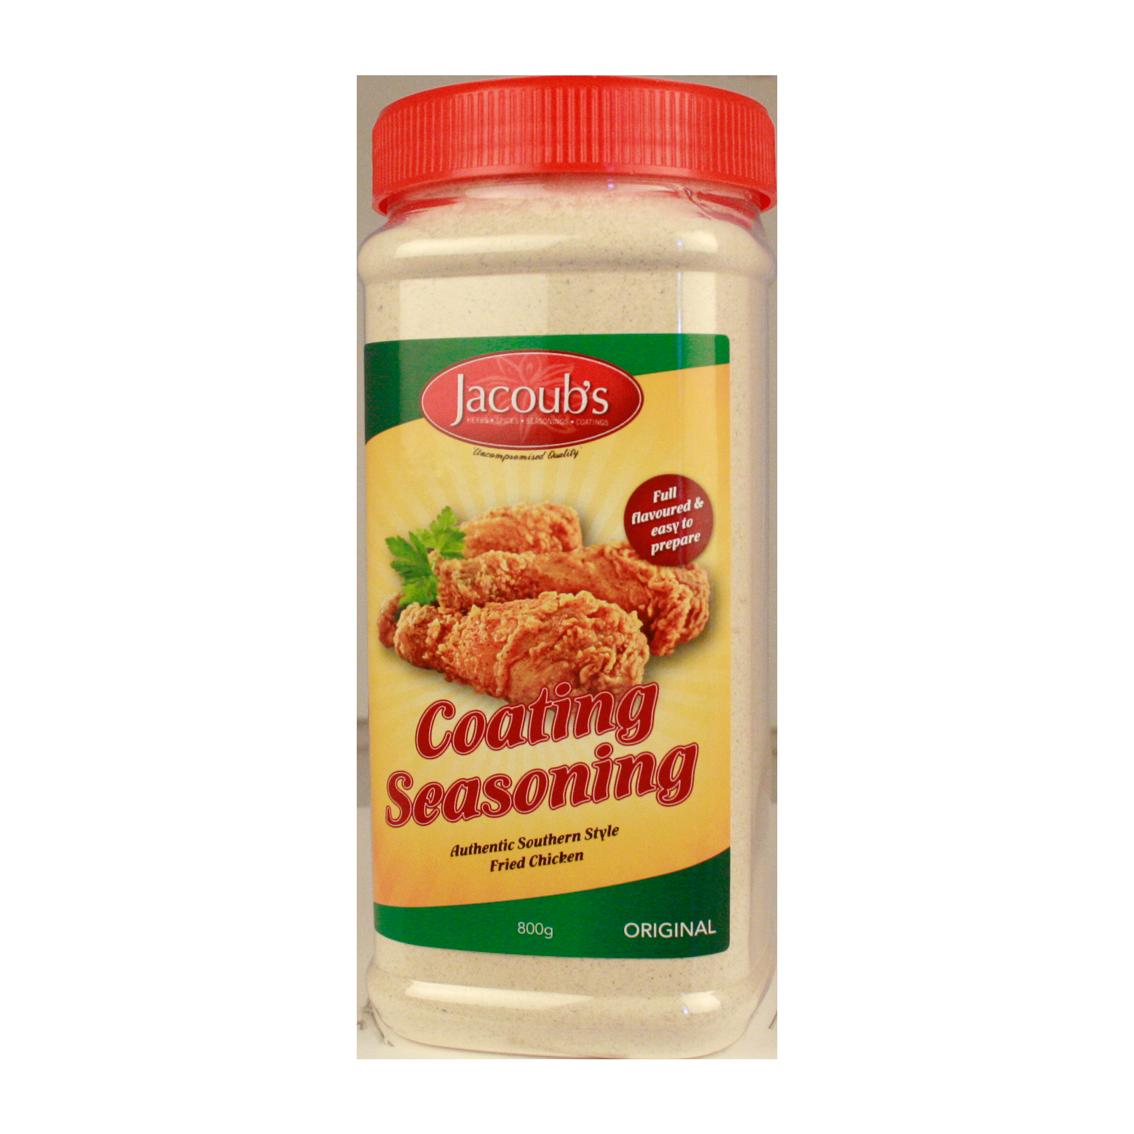 Jacoubs Fried Chicken Coating Seasoning - 700g